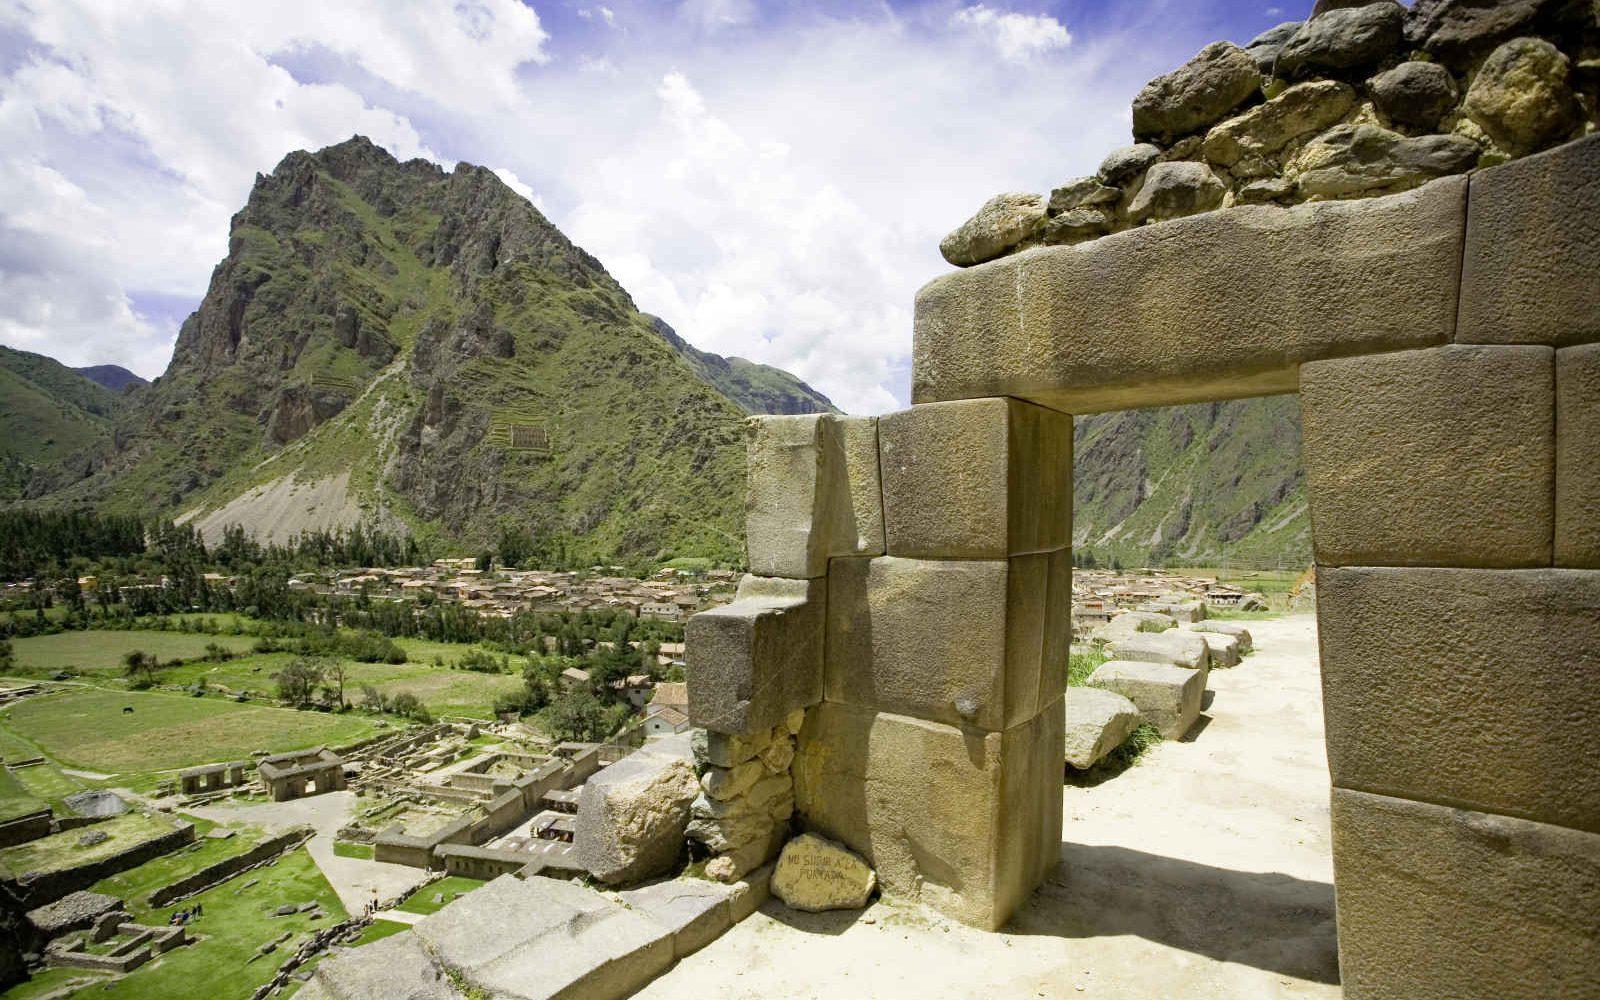 Incan ruins of Ollantaytambo, Peru